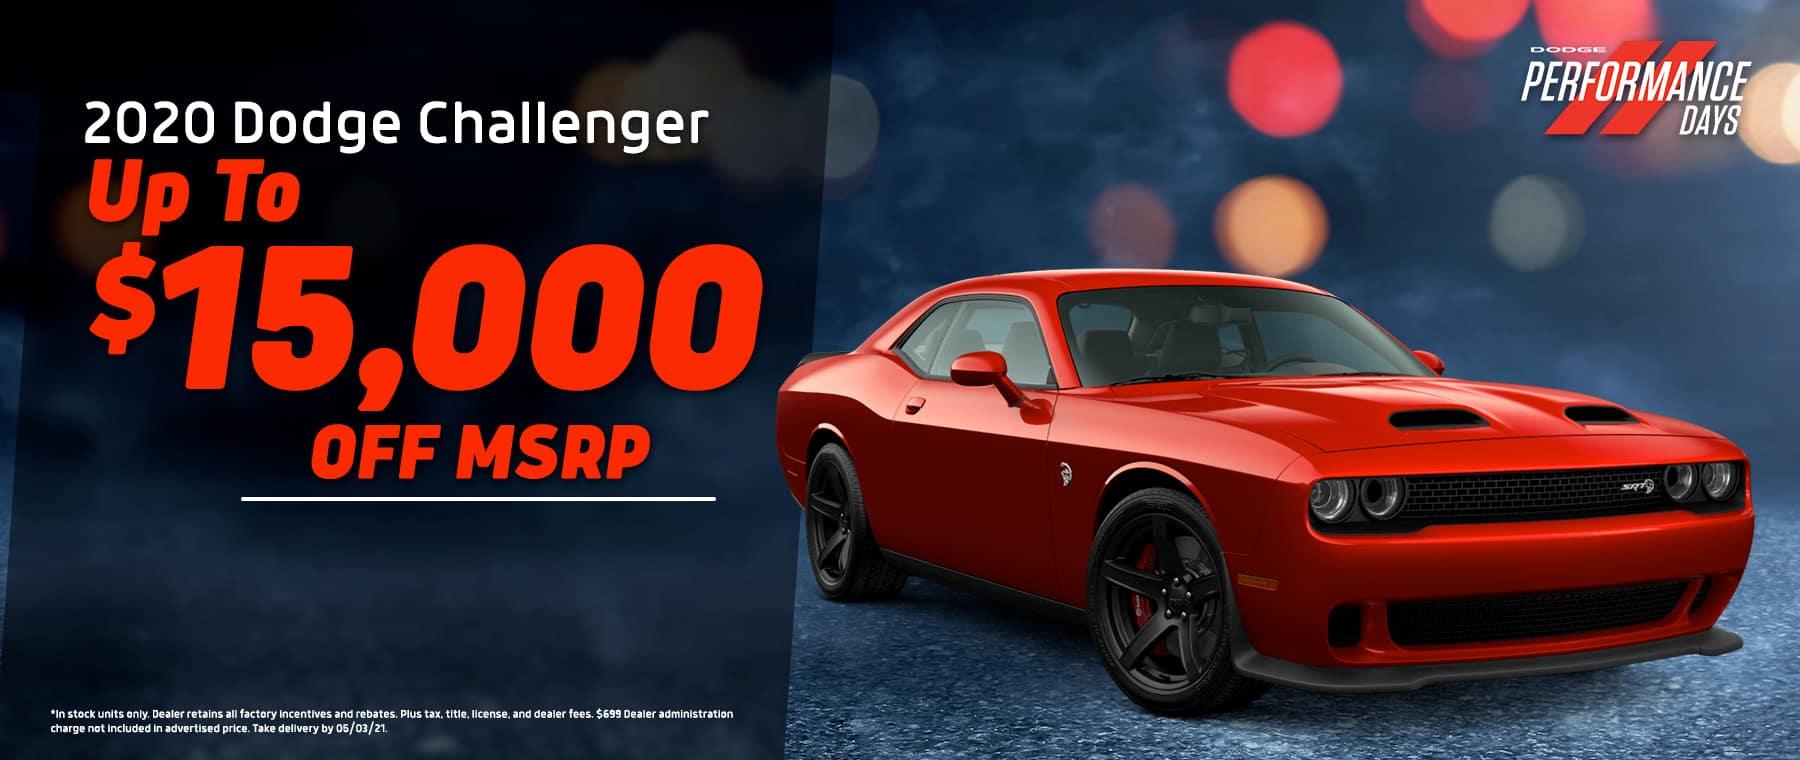 Hendrick-Dodge-RAM-Fiat-Cary-Apri21_TR_Website-Assets-challenger-1800×760